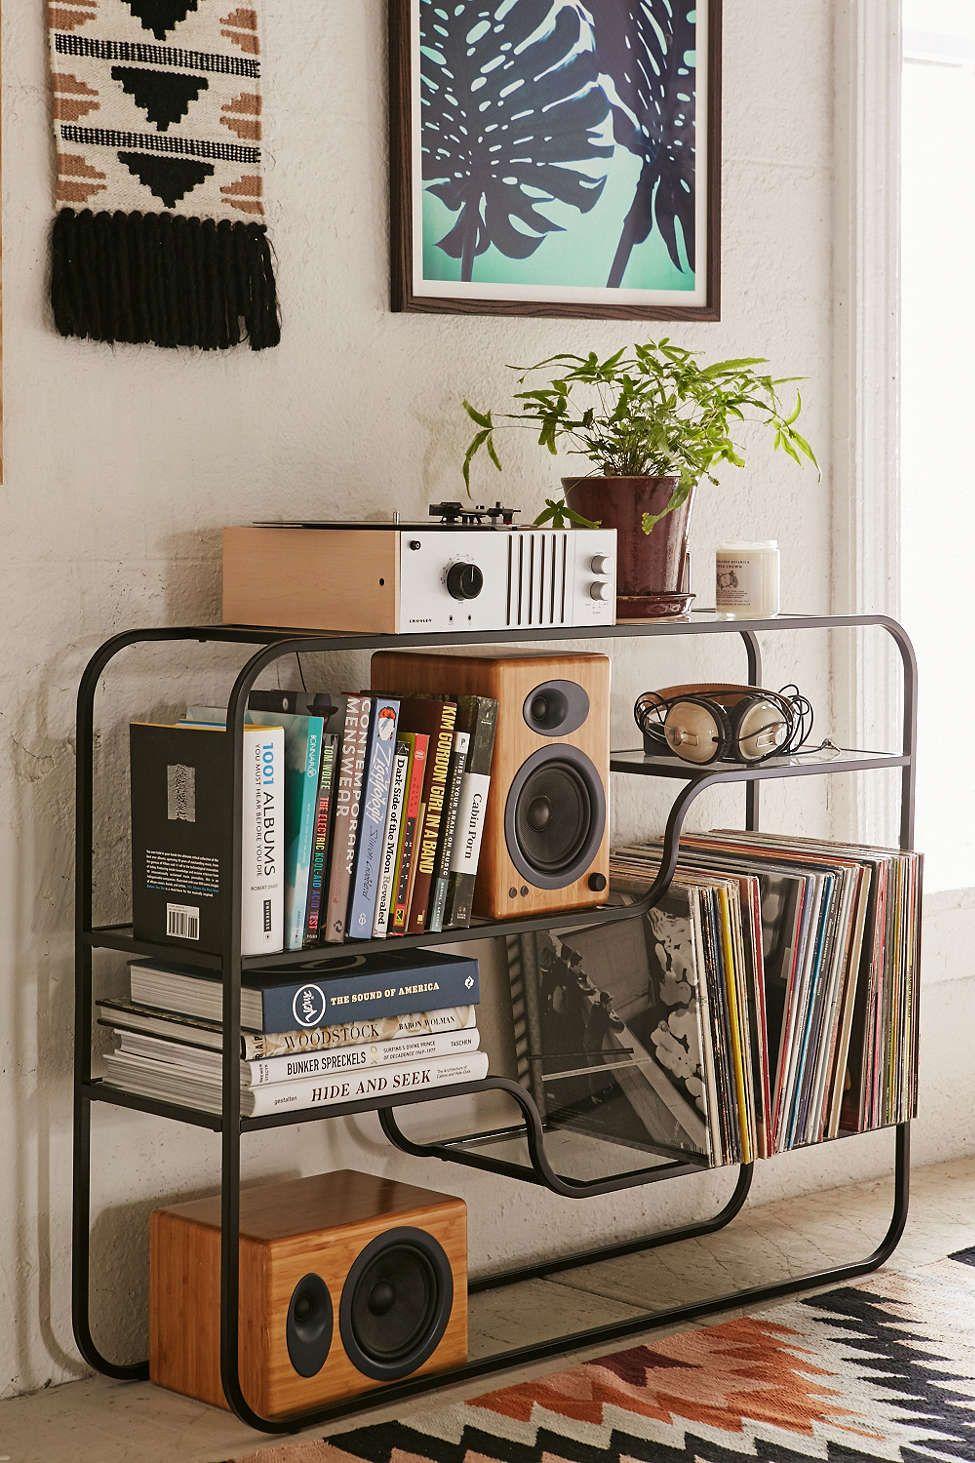 odile bookshelf furniture entryway home decor decor. Black Bedroom Furniture Sets. Home Design Ideas